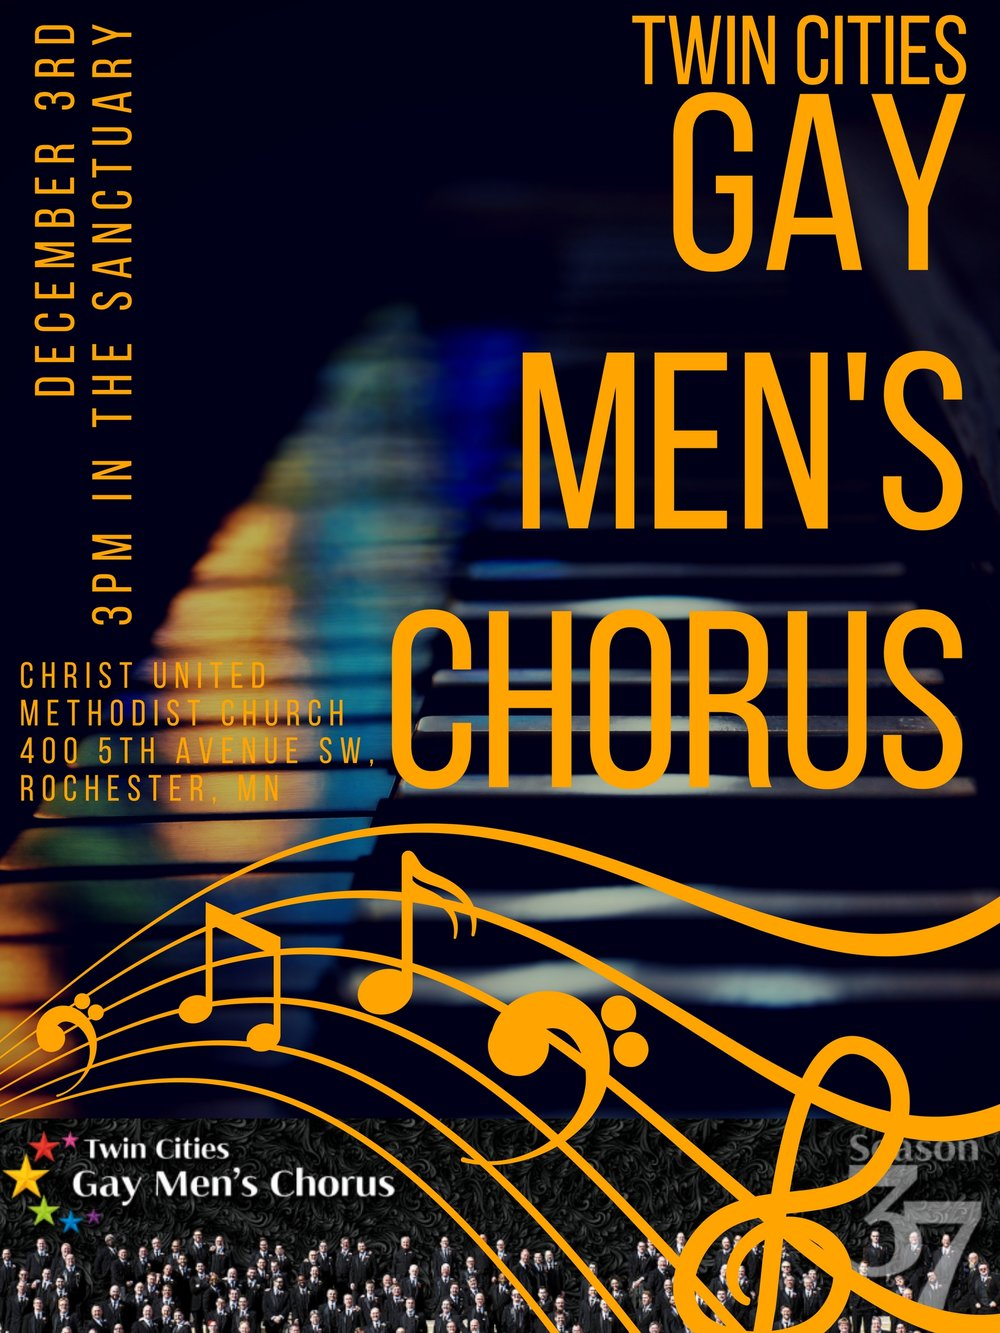 Gay Men's Chorus Poster.jpg